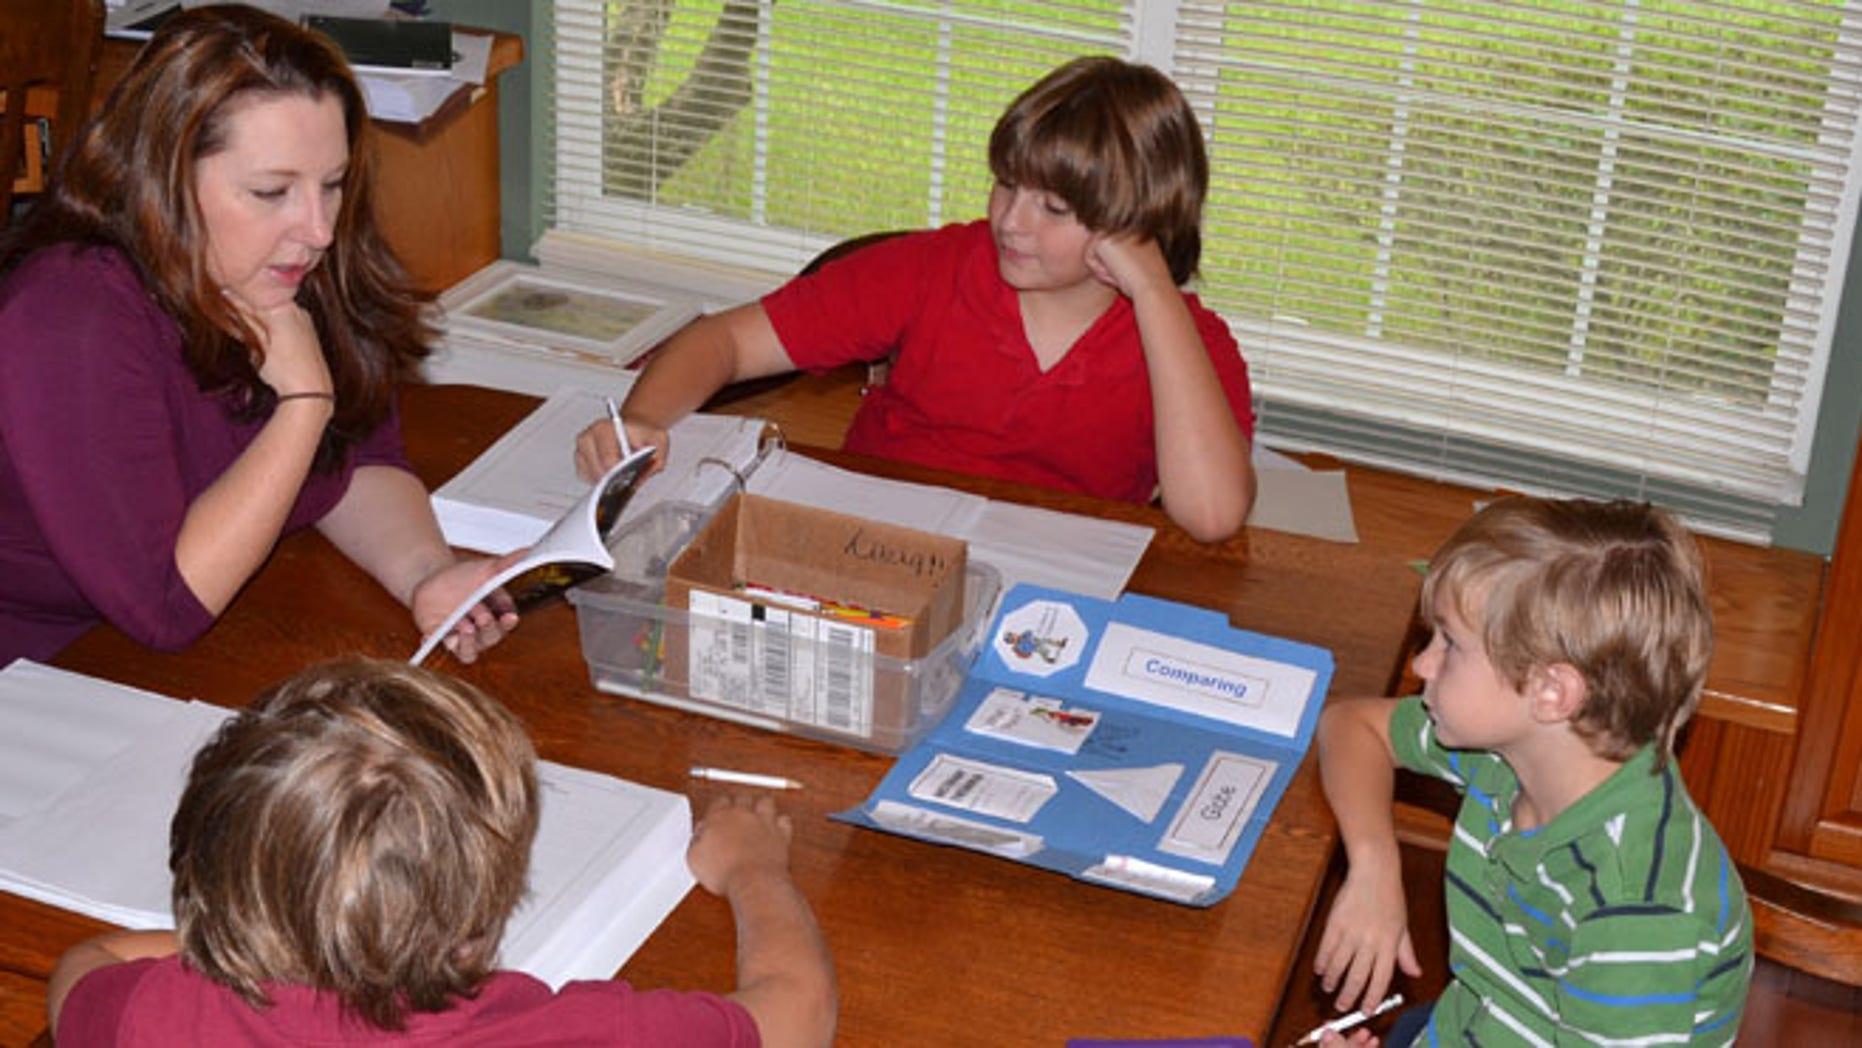 Jill Finnerty Ricardo, of Dade City, Fla., is seen teaching a lesson at home to three of her children, Rhett, 9, Roman, 11, and Reagan, 6.